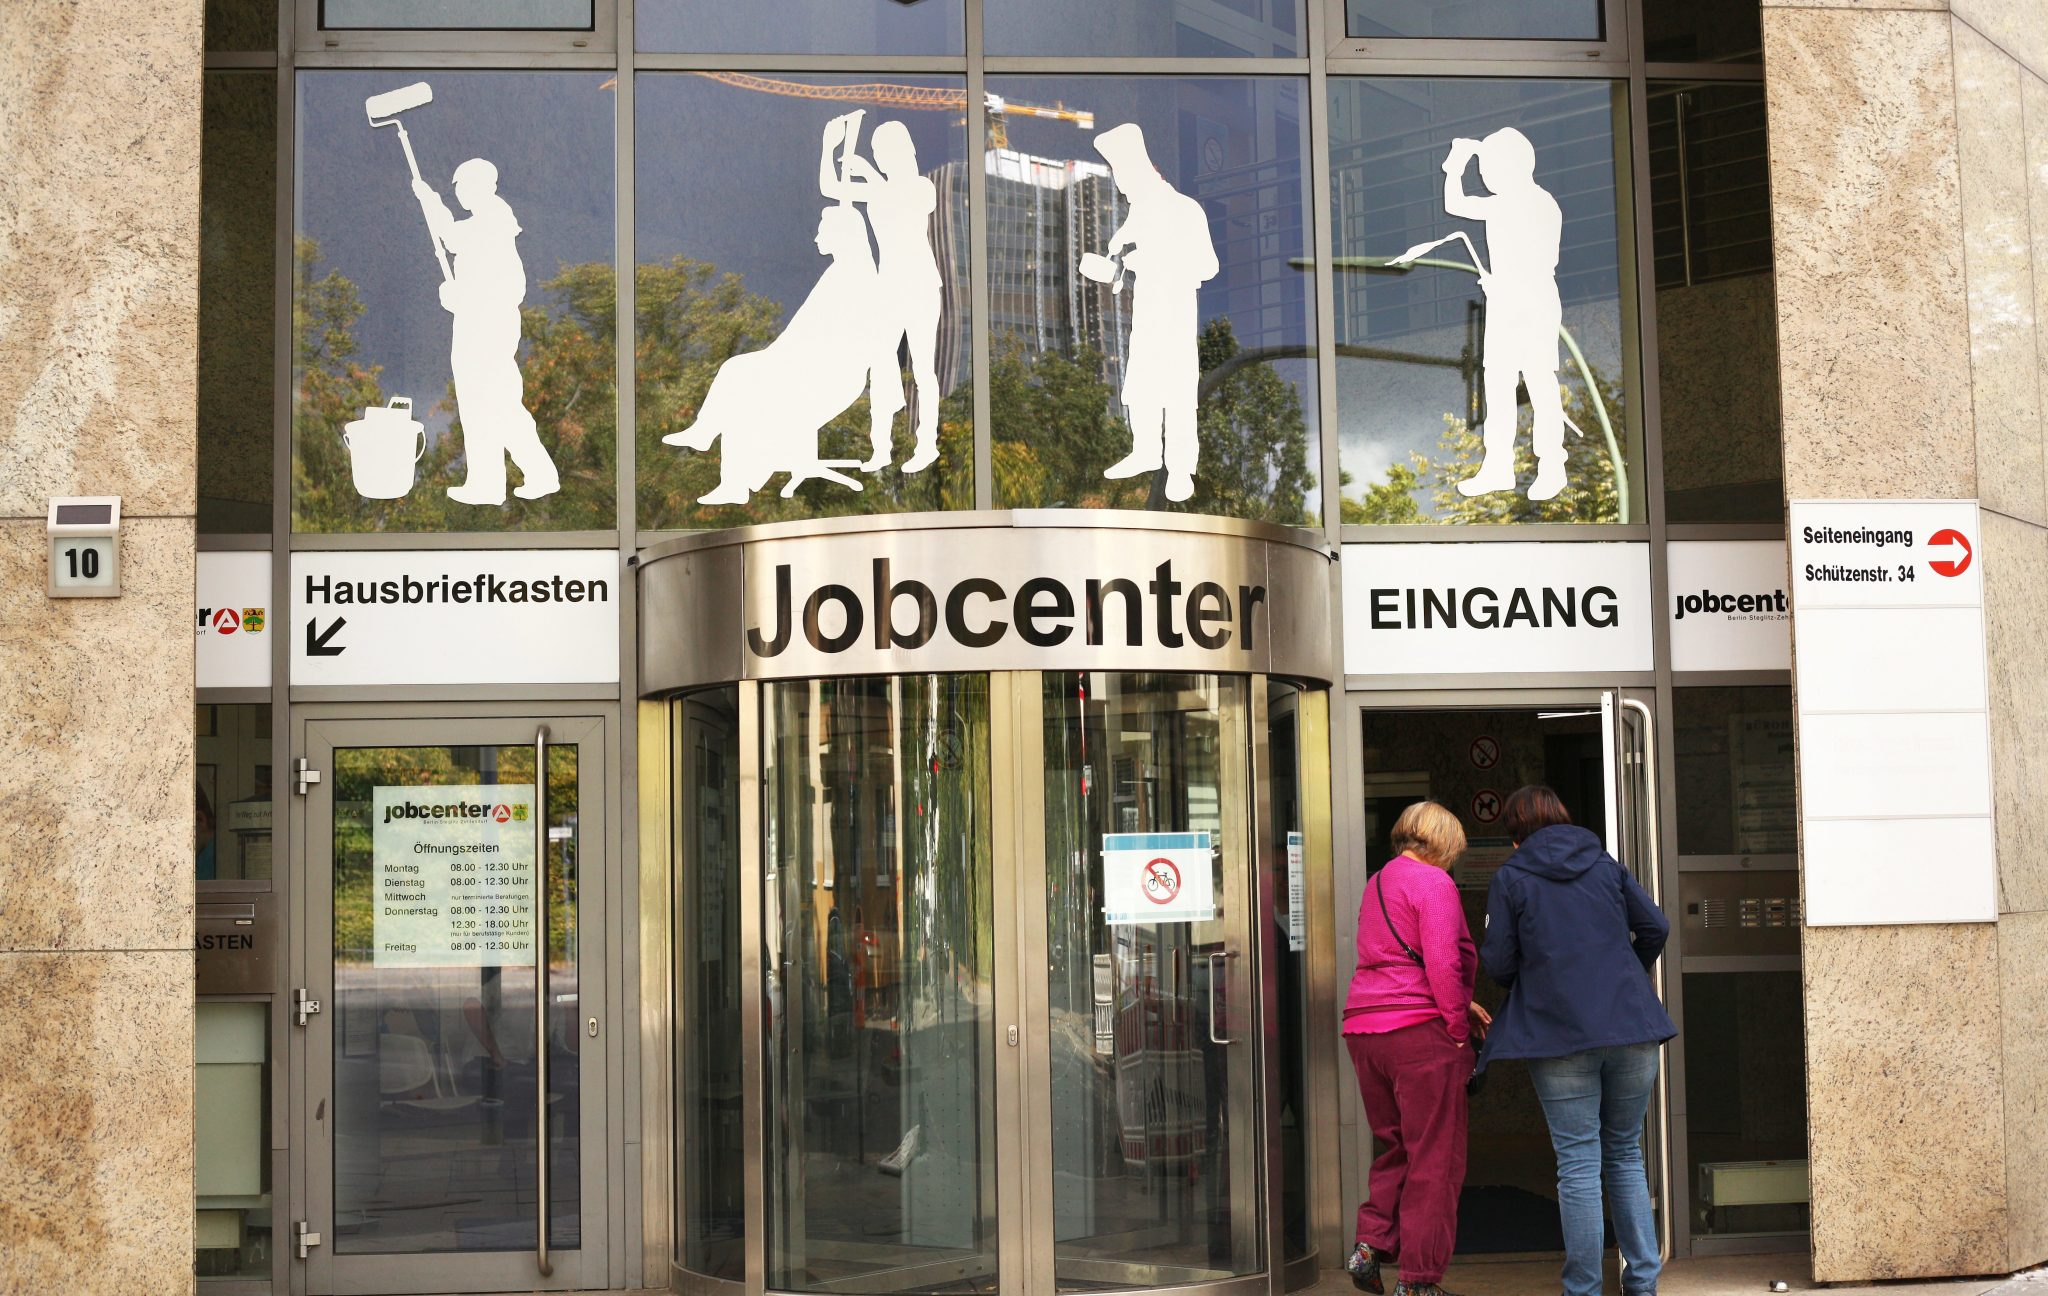 Jobcenter in Berlin